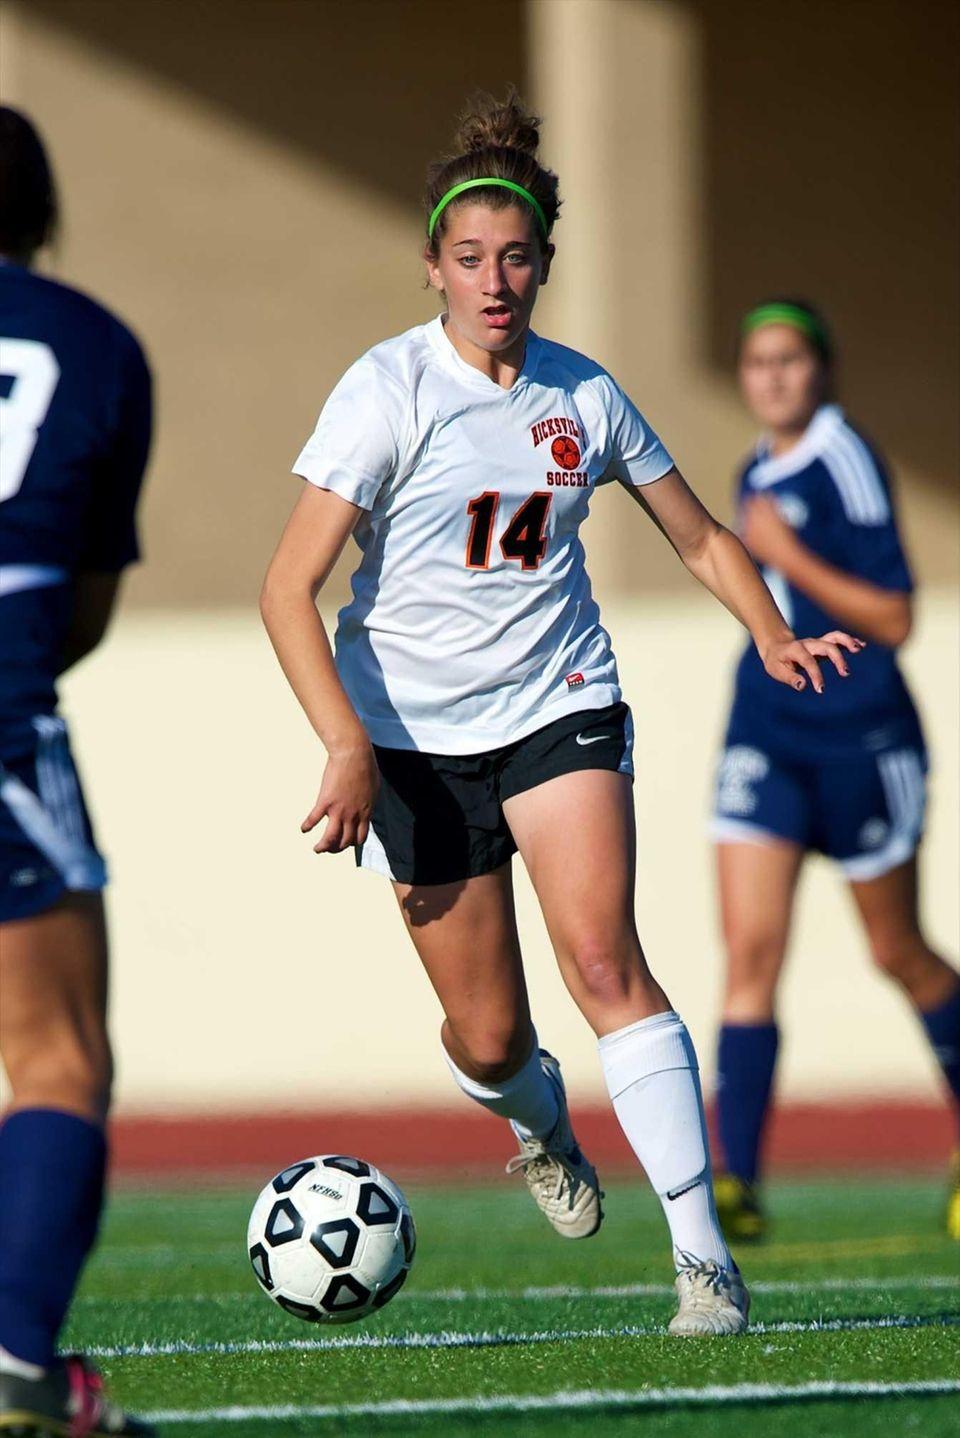 Hicksville's Courtney Locurcio (14) handles the ball at